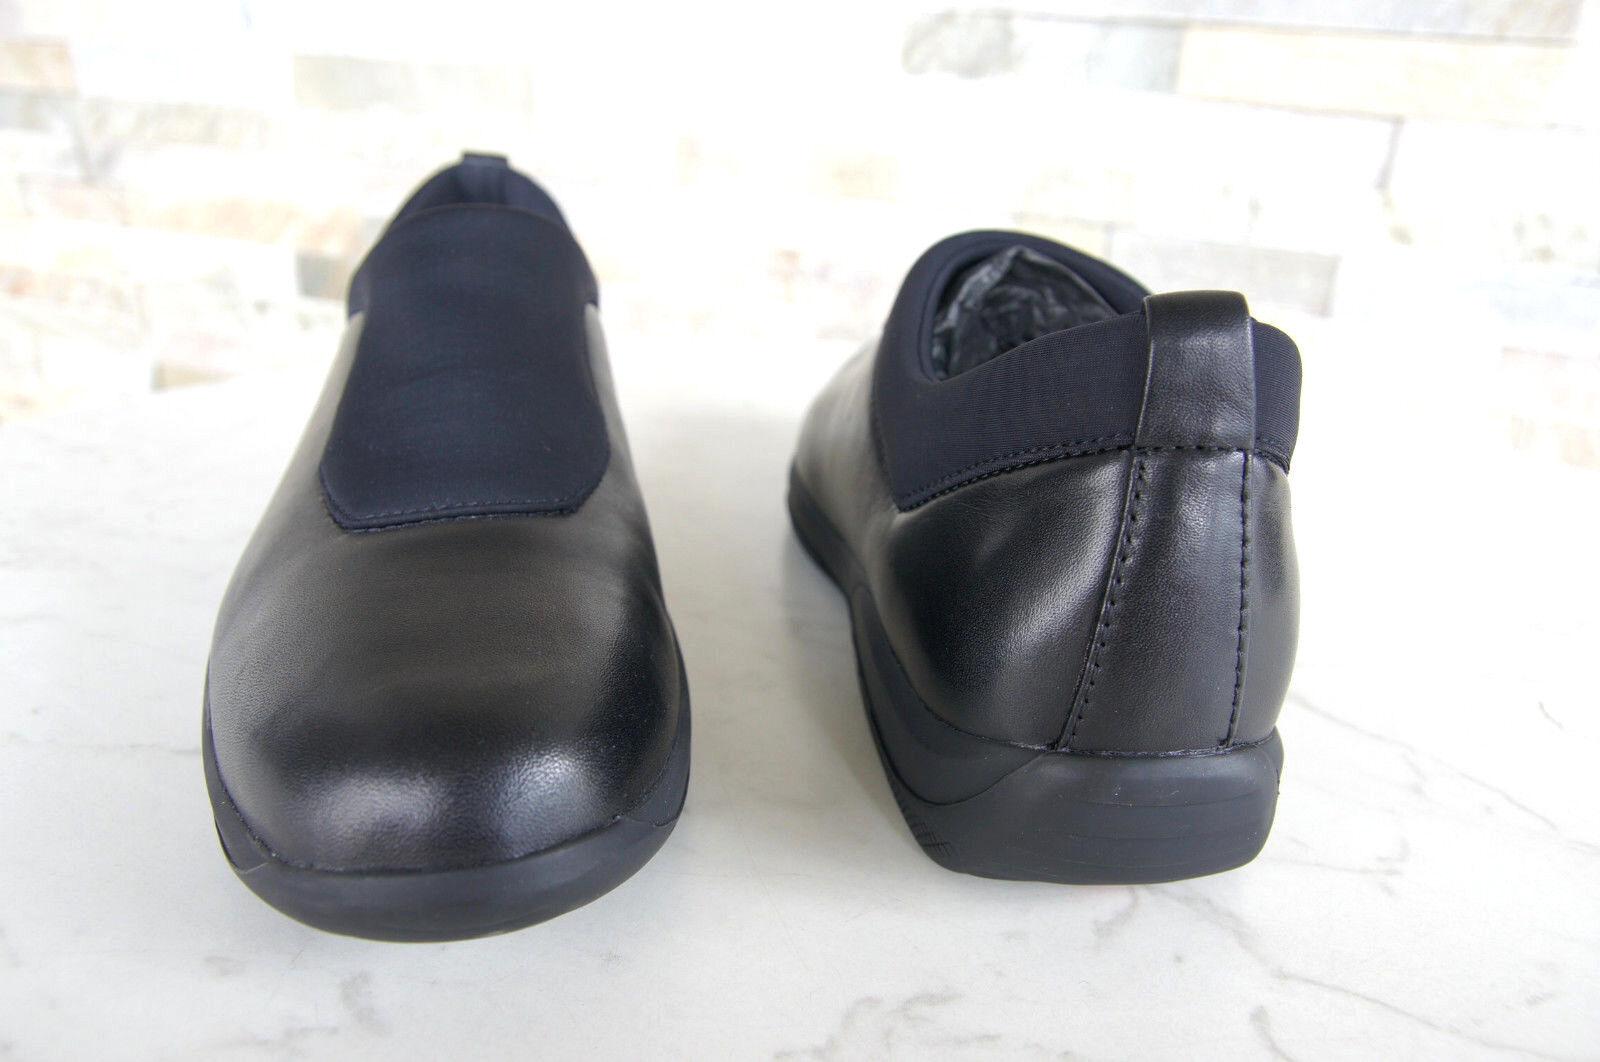 PRADA schwarz Gr 40 Slipper Mokassins Slip-On Halbschuhe Schuhe schwarz PRADA NEU caf535